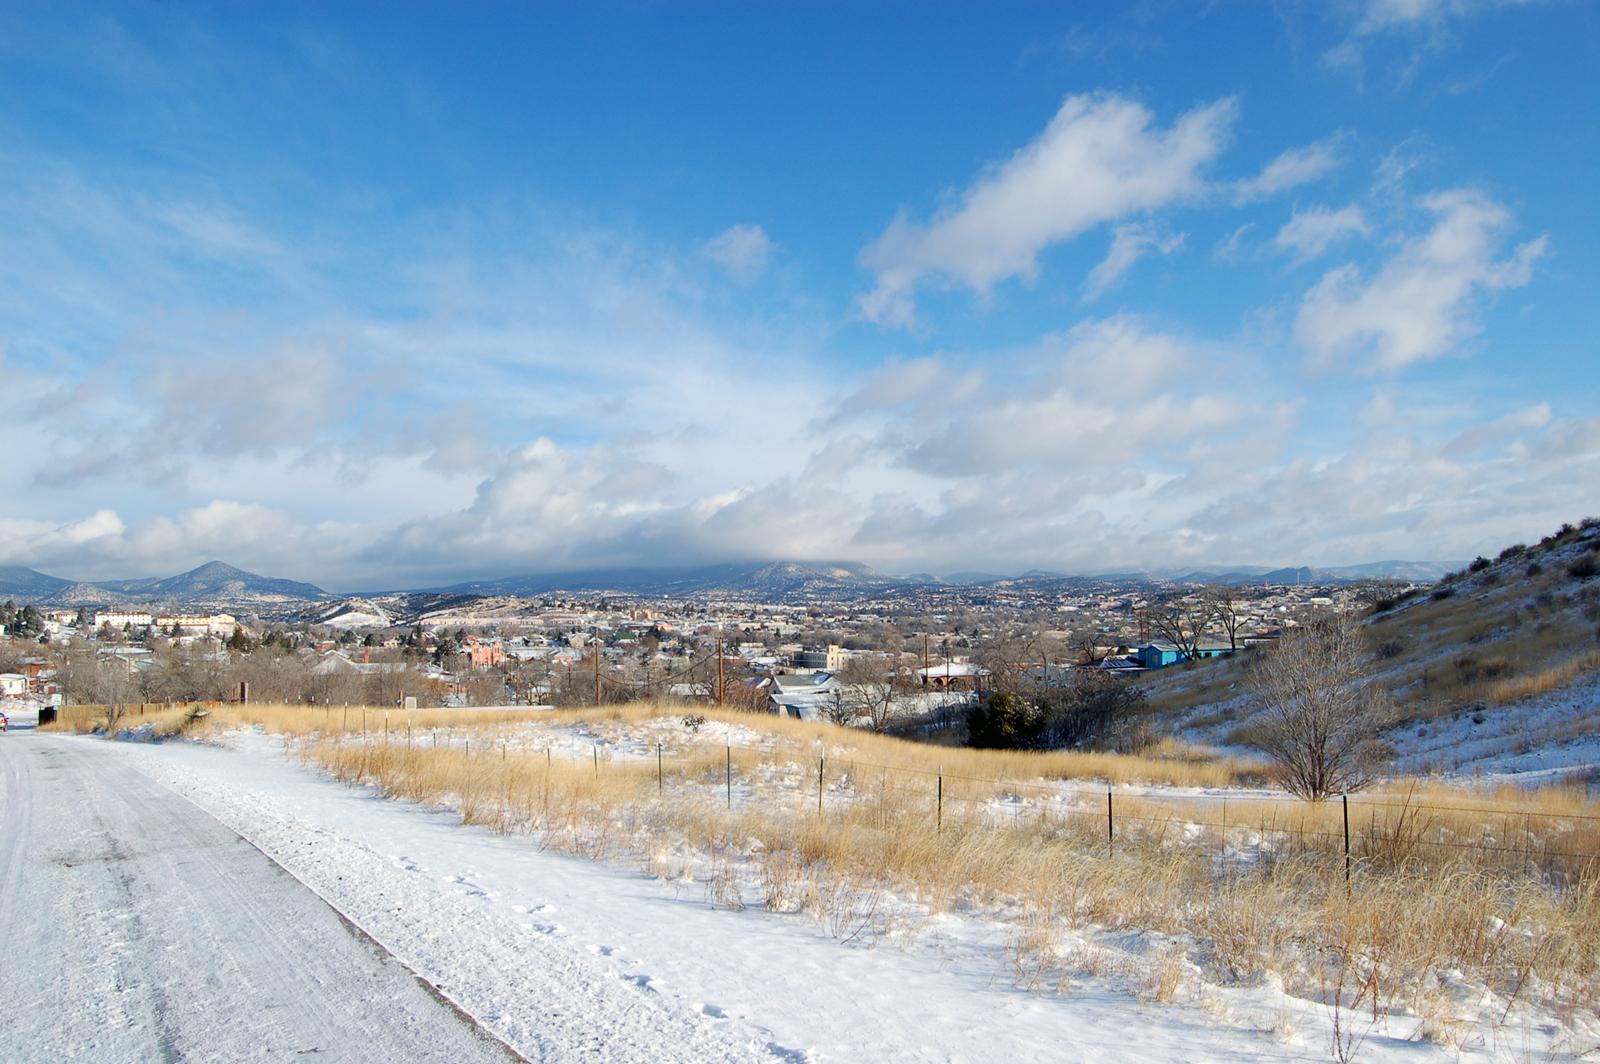 Silver City Snow